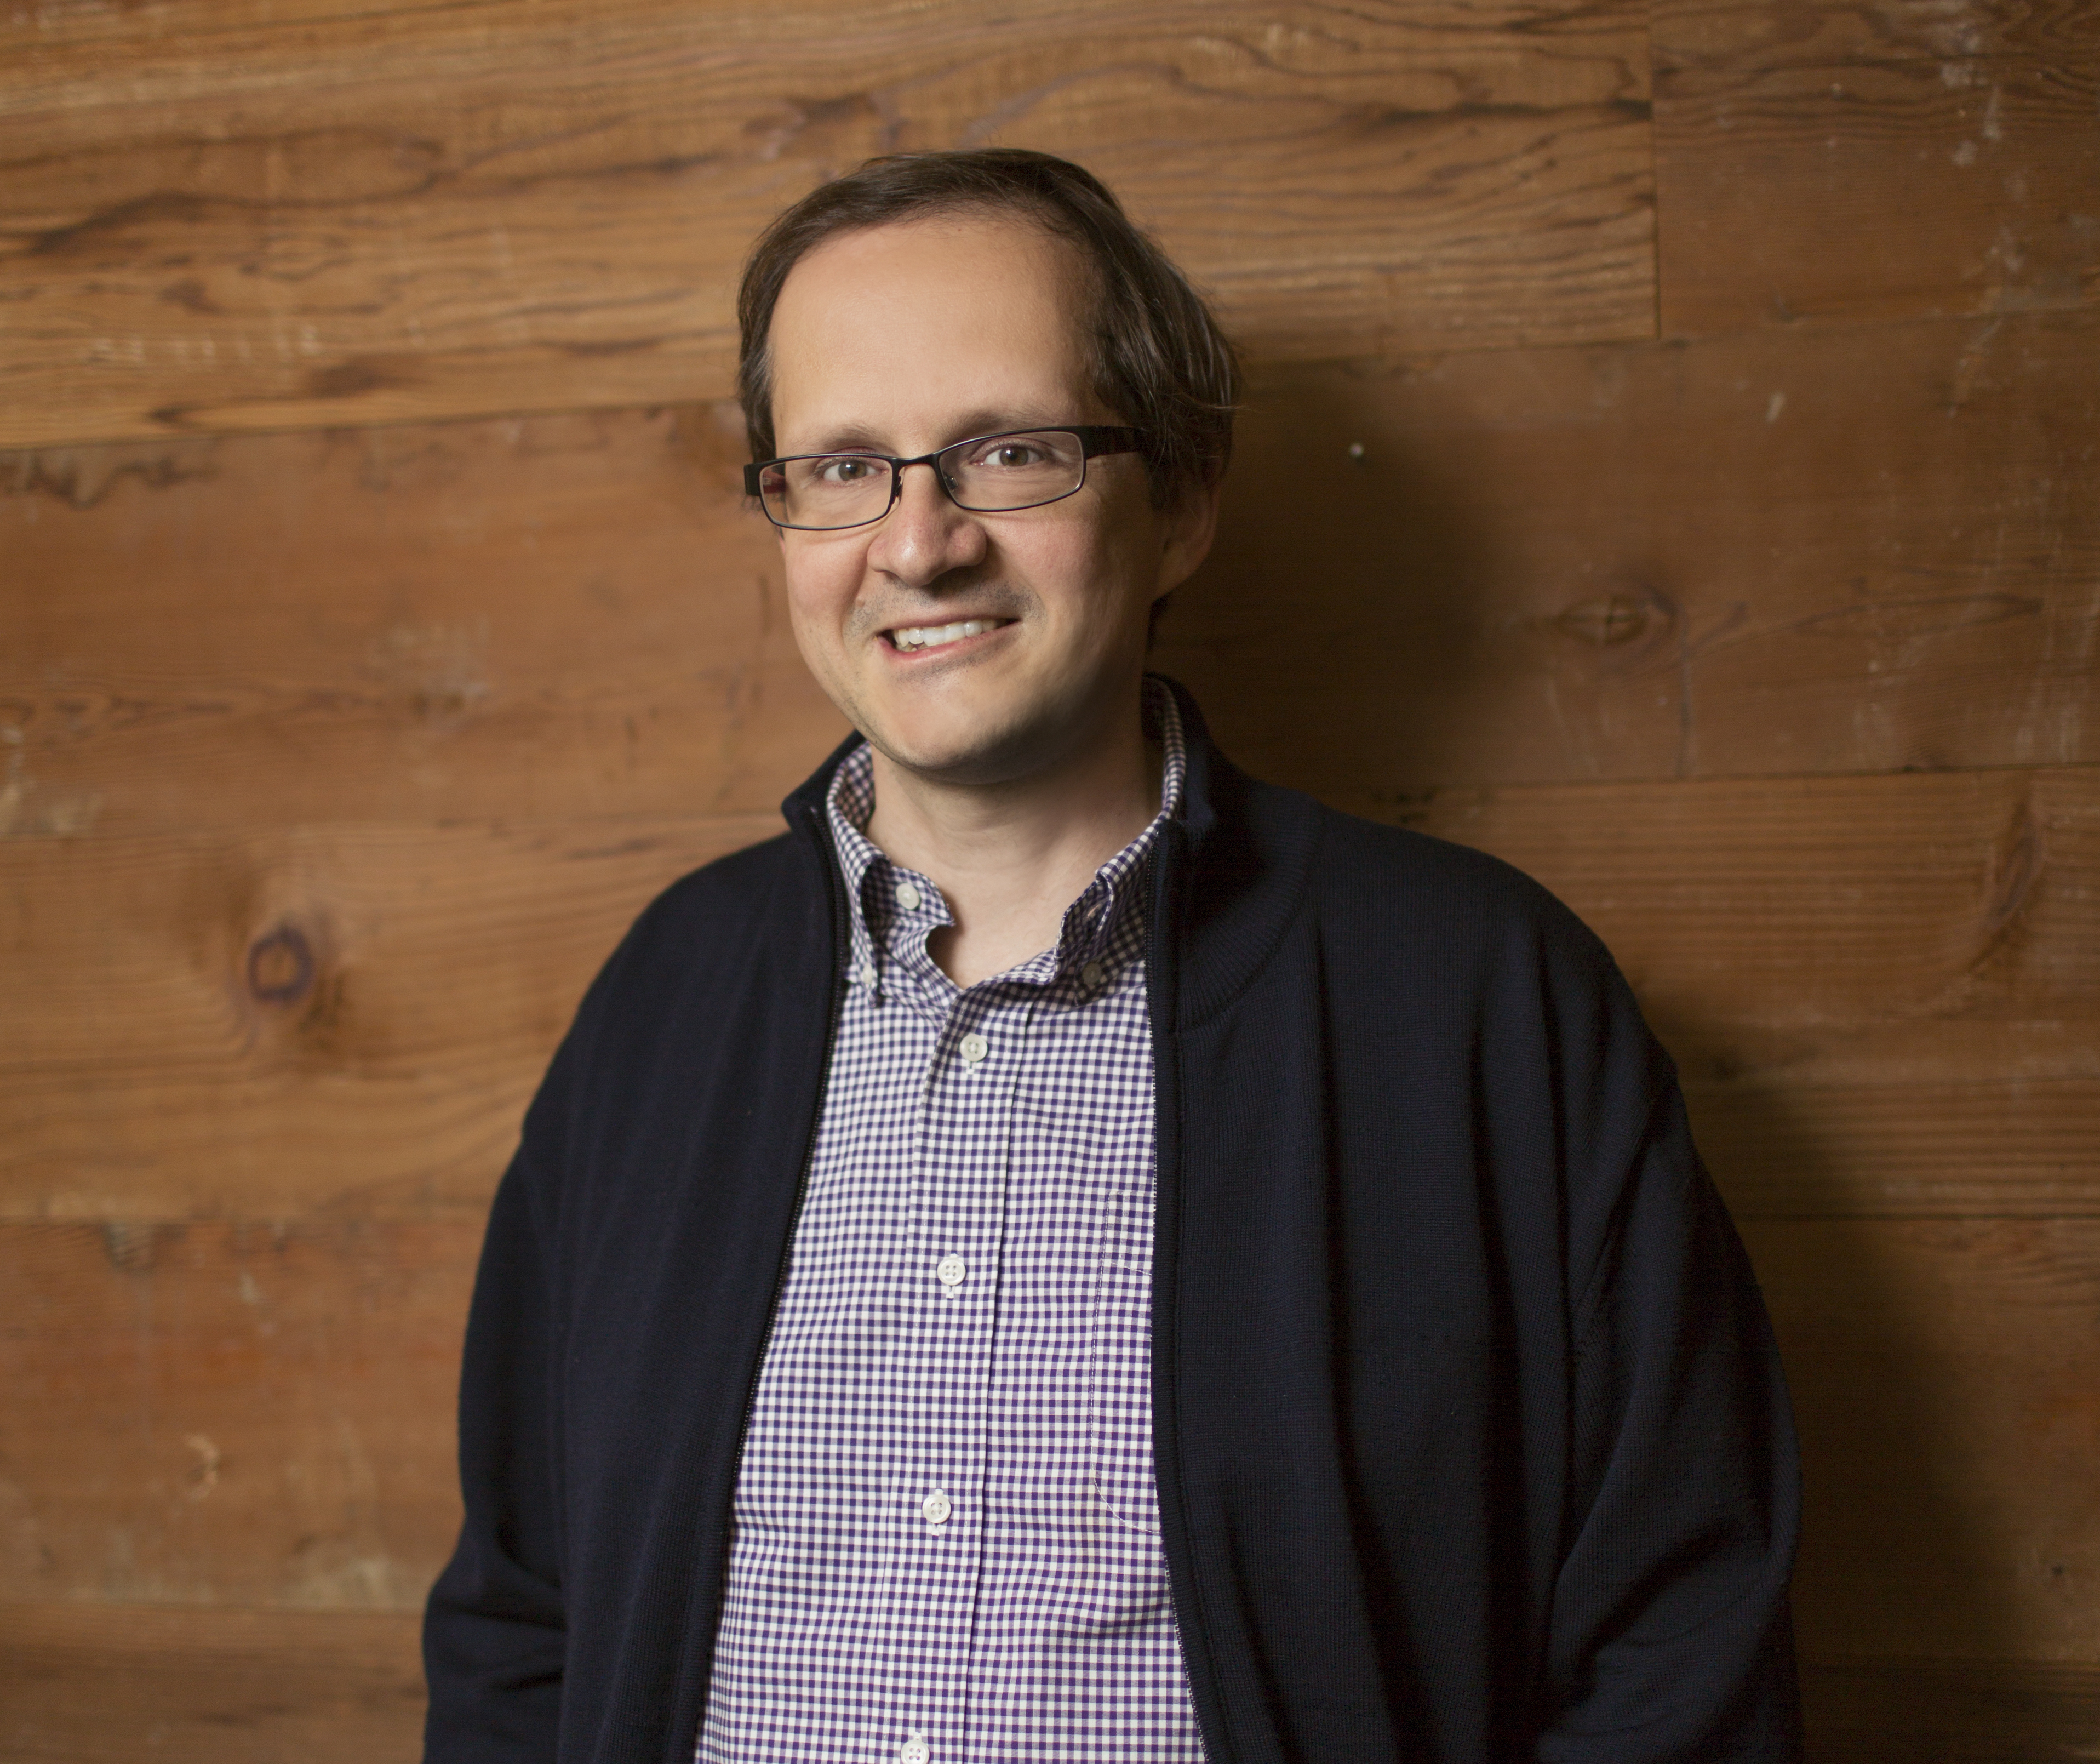 App Annie CEO and founder Bertrand Schmitt